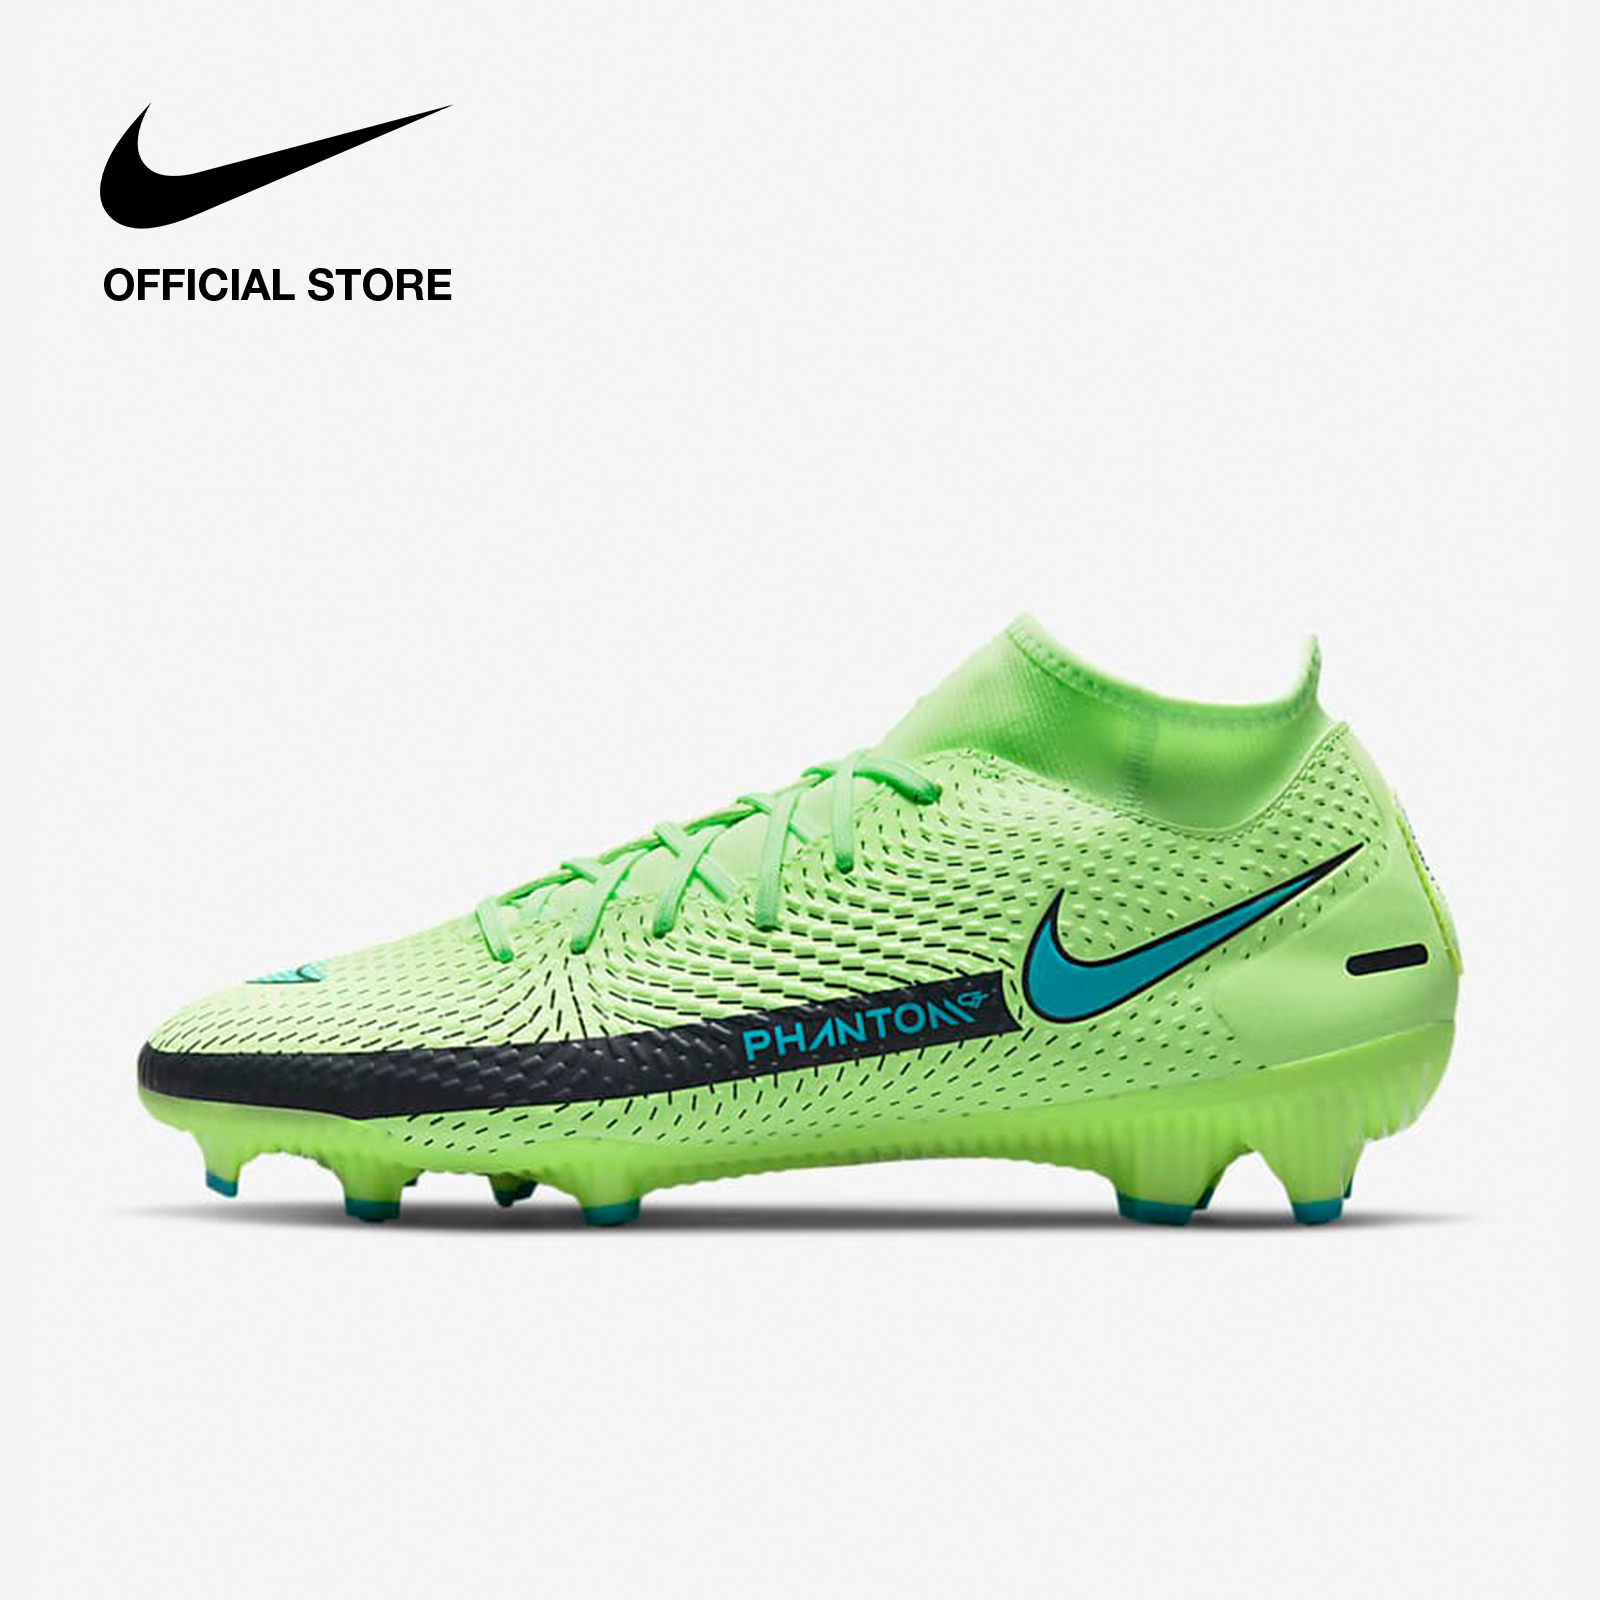 Buy Nike Football Shoes Online | lazada.sg